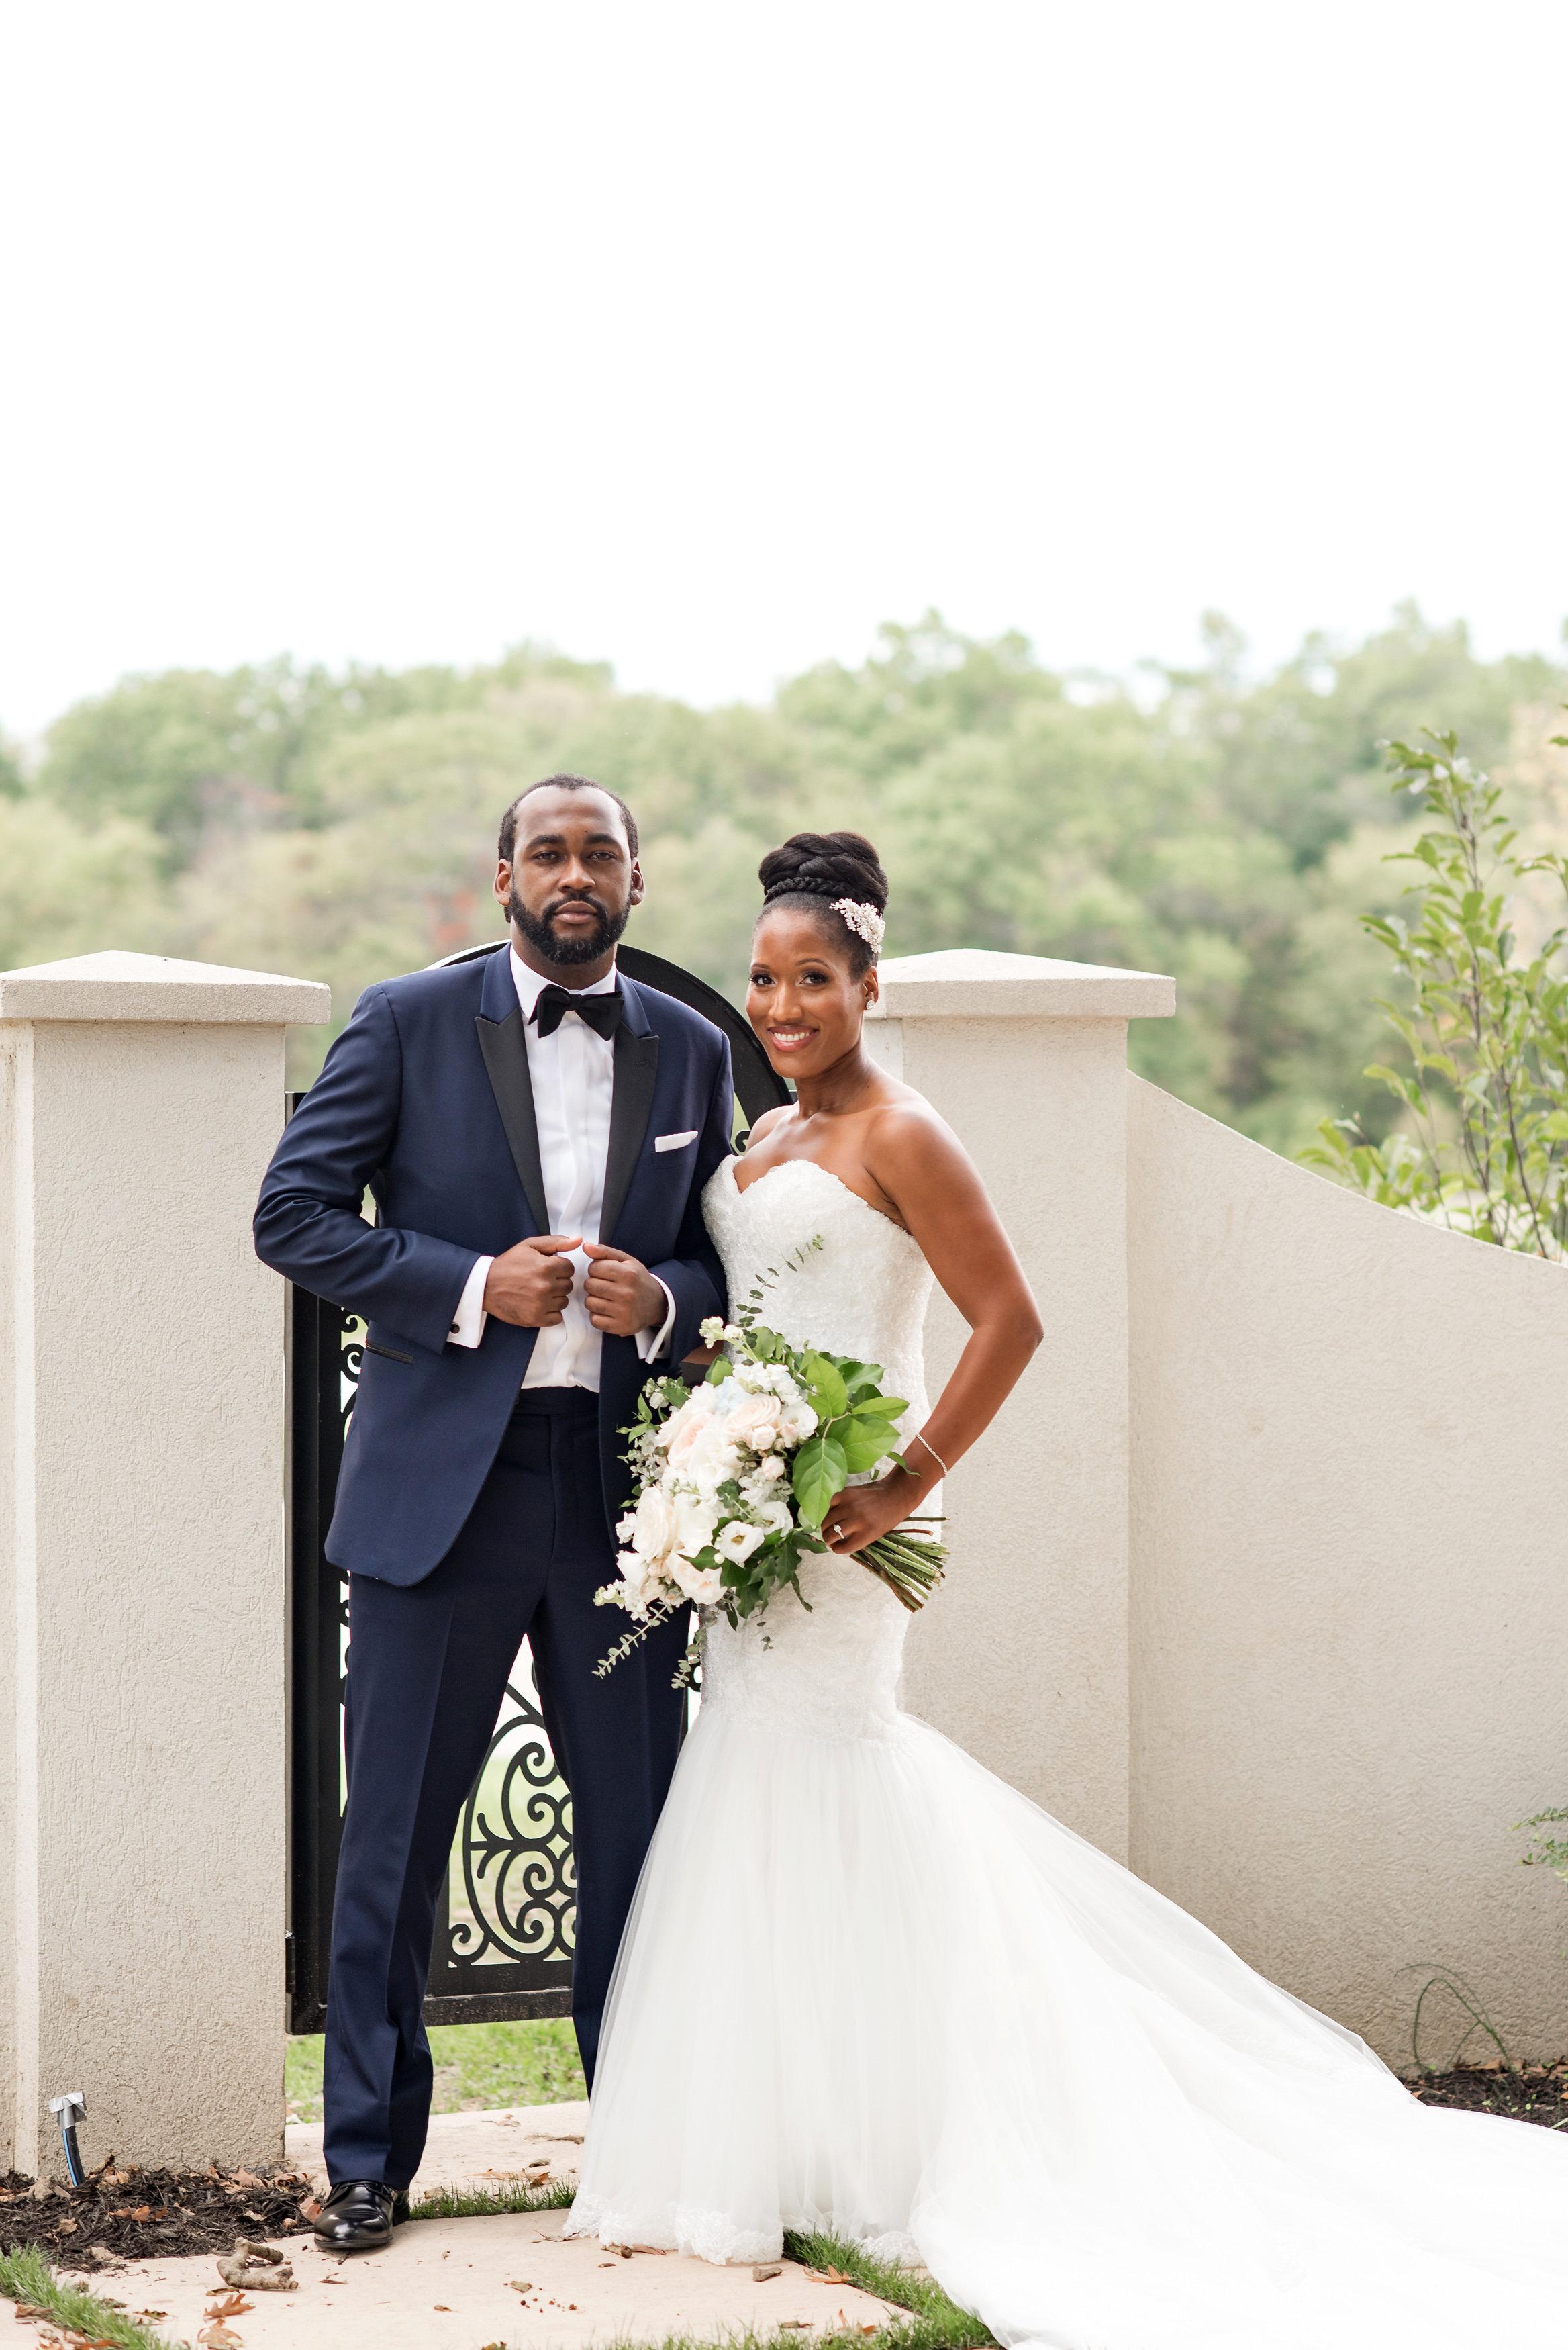 kenisha wendall wedding bride groom portrait outdoor